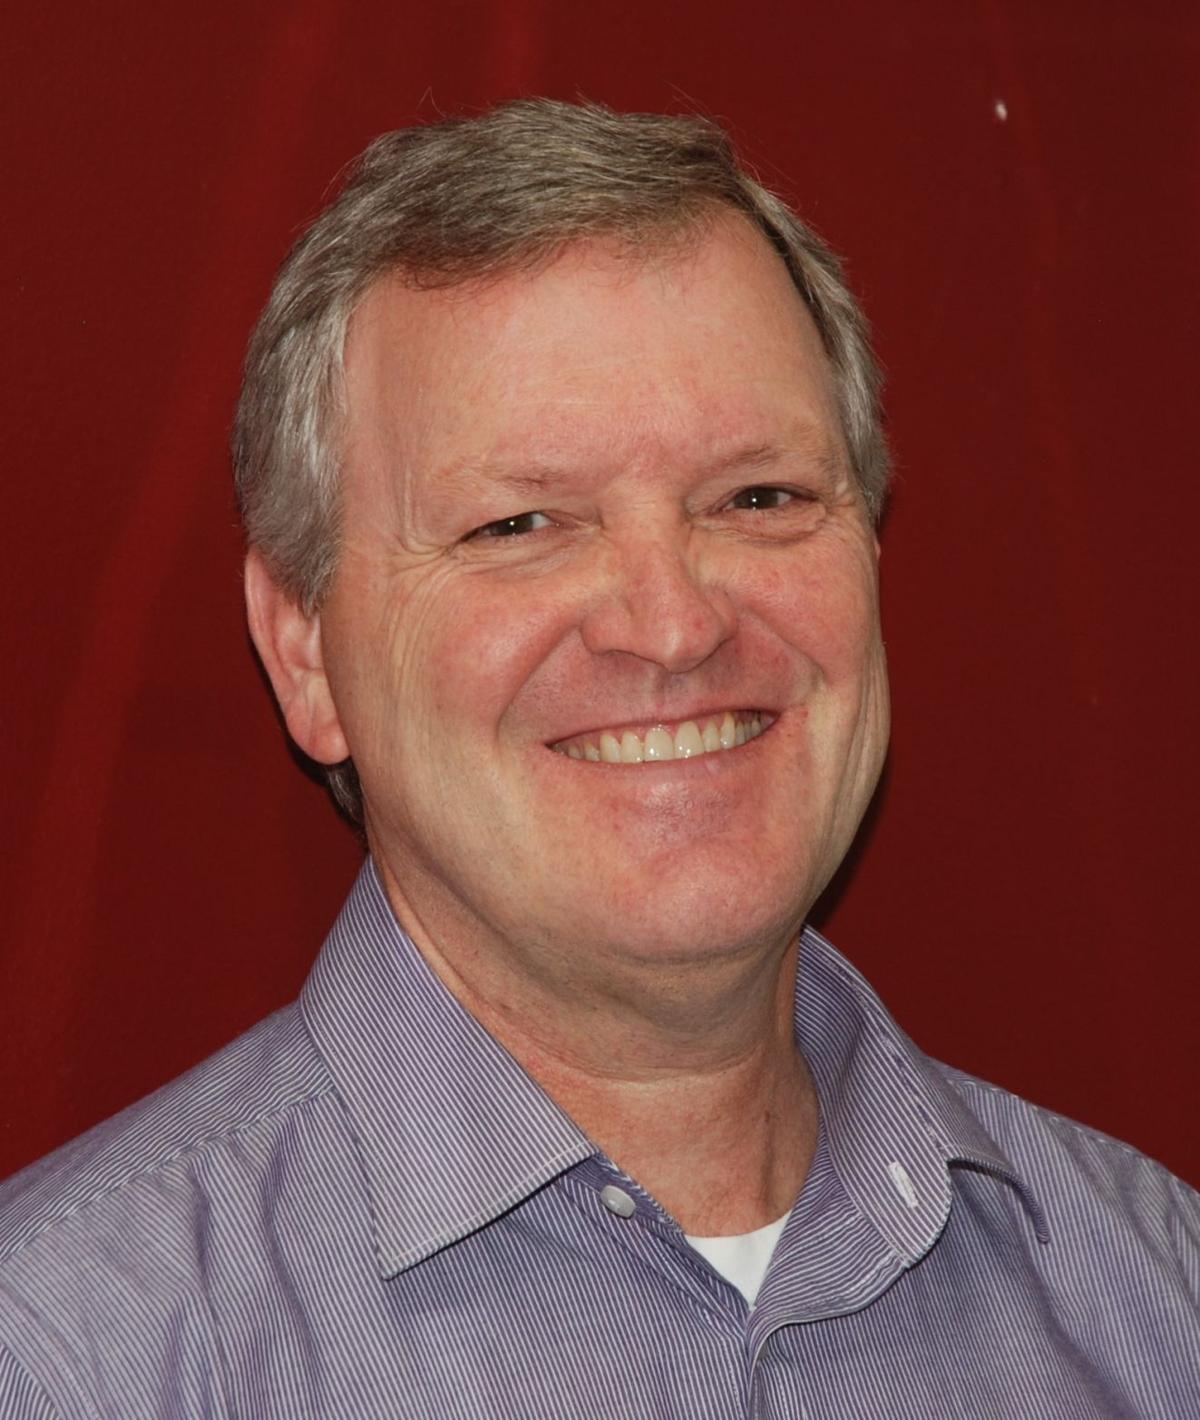 Jeff Barber